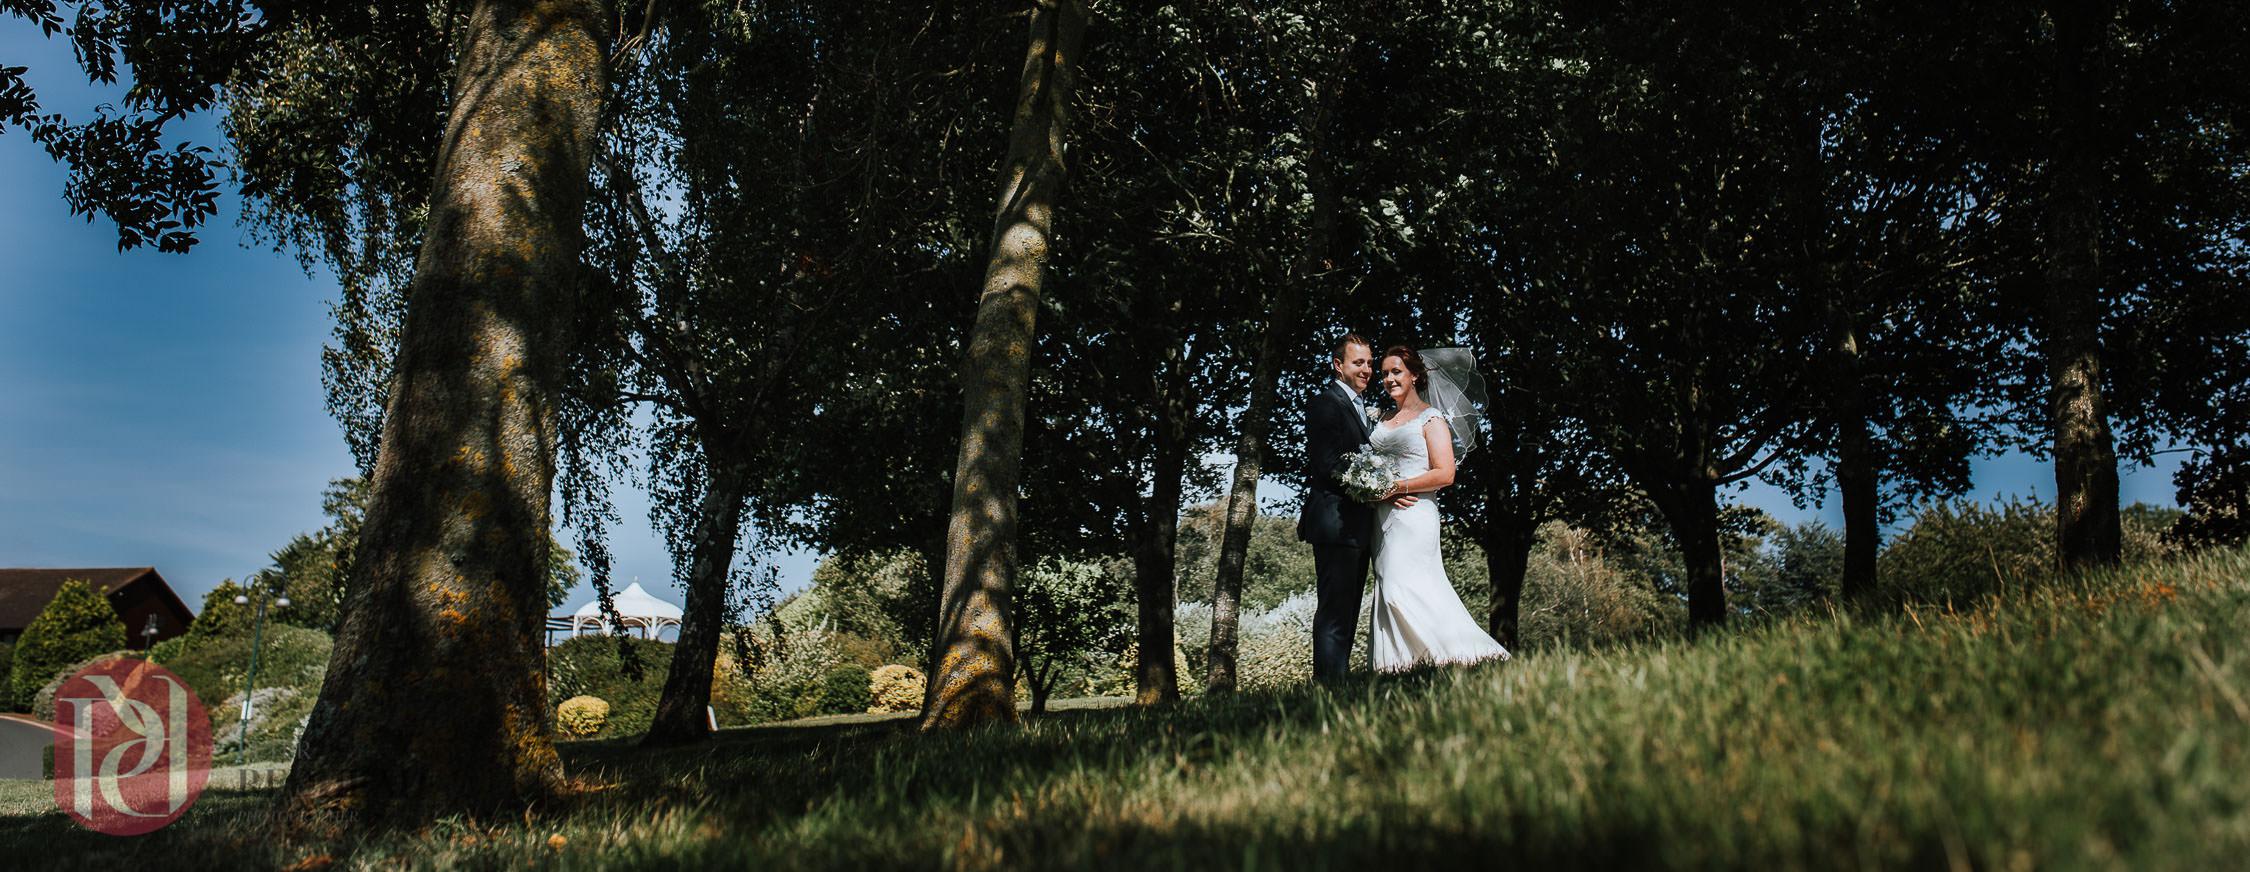 Summer wedding at Barnsdale Hall | Tara & George